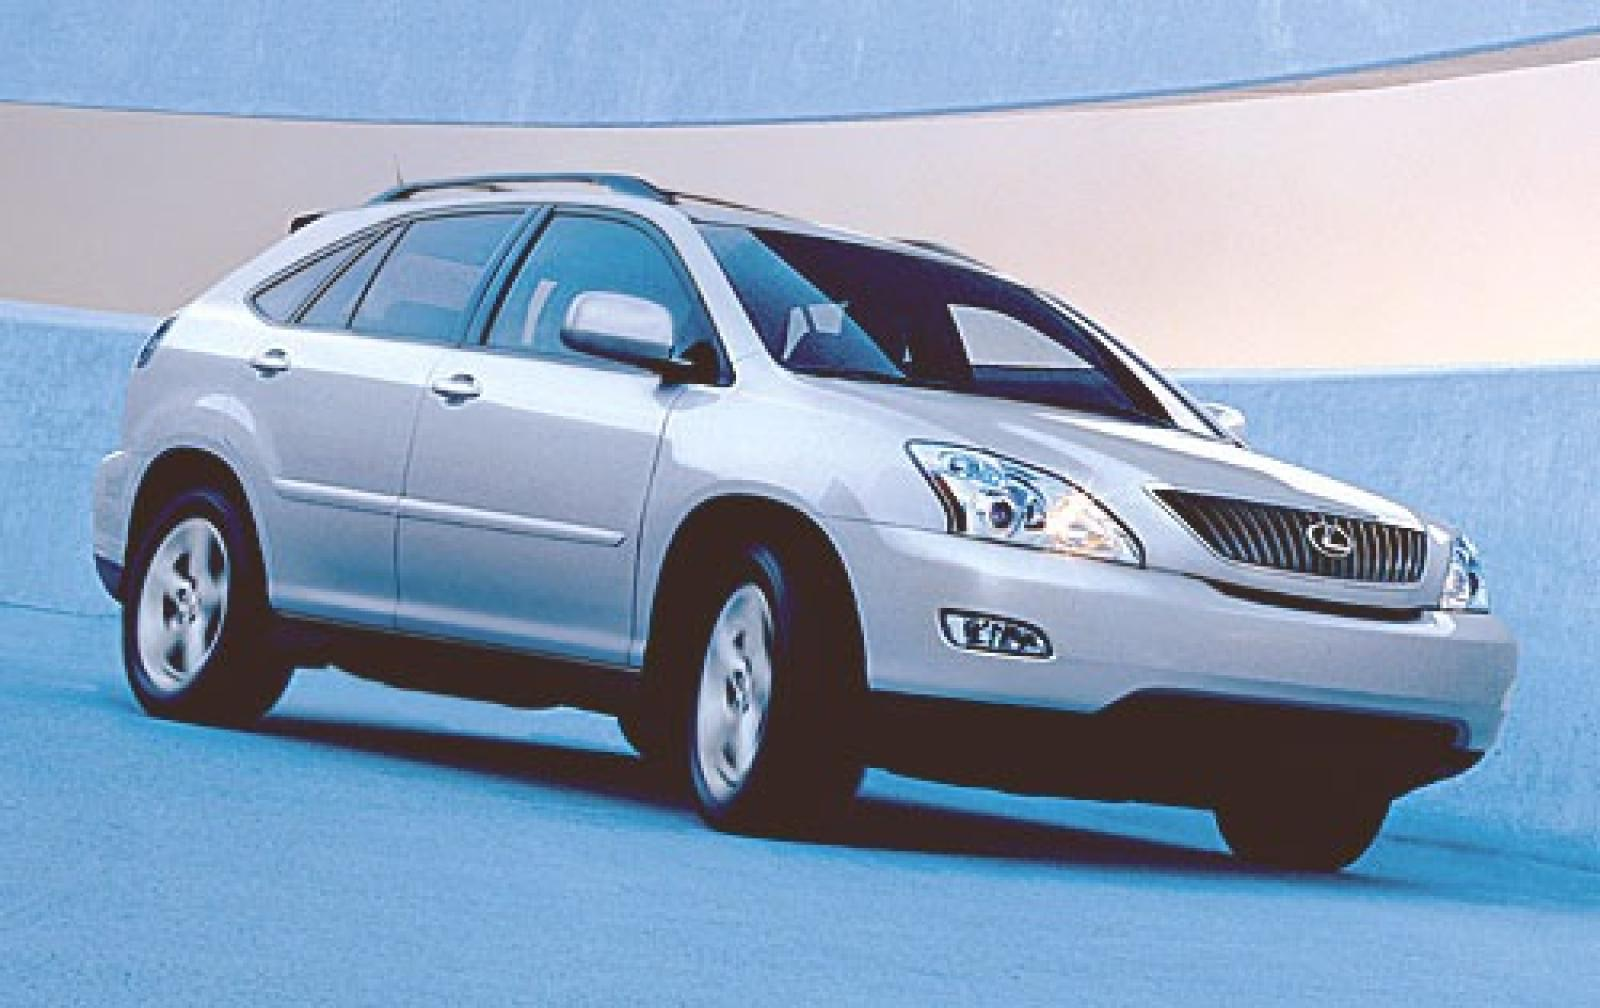 2005 Lexus Rx 330 Information And Photos Zombiedrive Rx330 Blue 800 1024 1280 1600 Origin